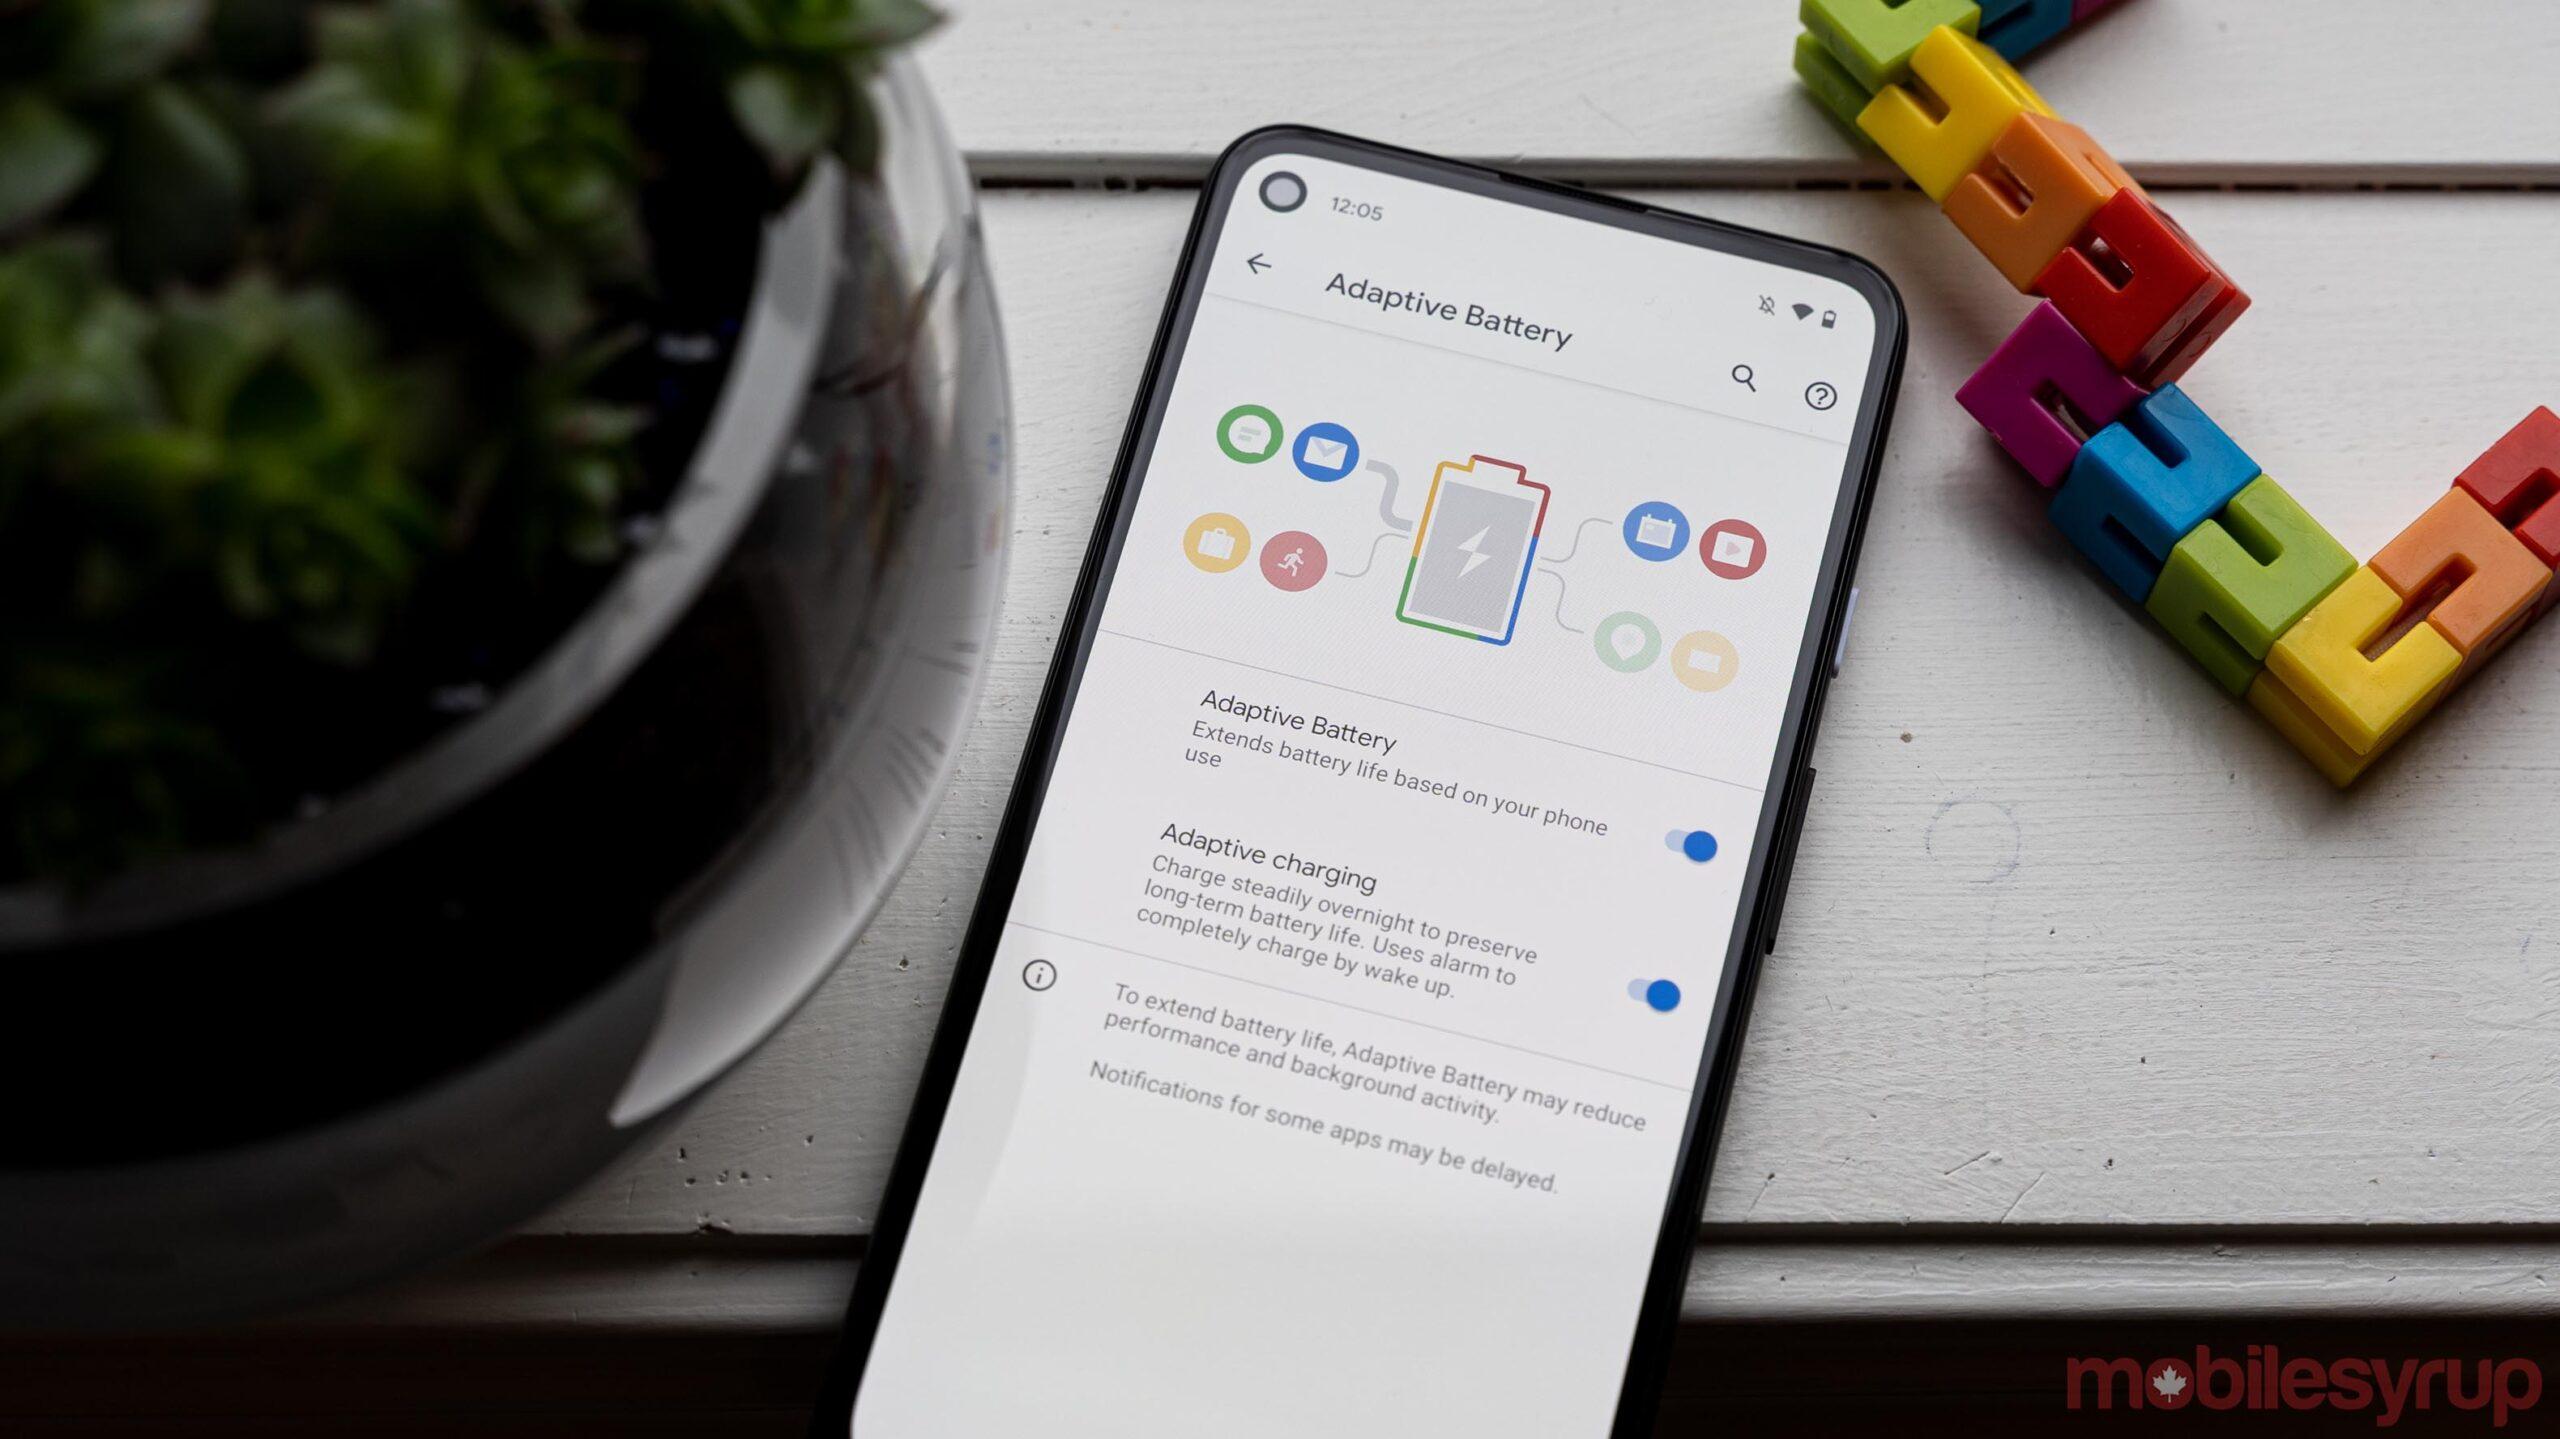 Google Pixel 4a 5G Adaptive Charging setting